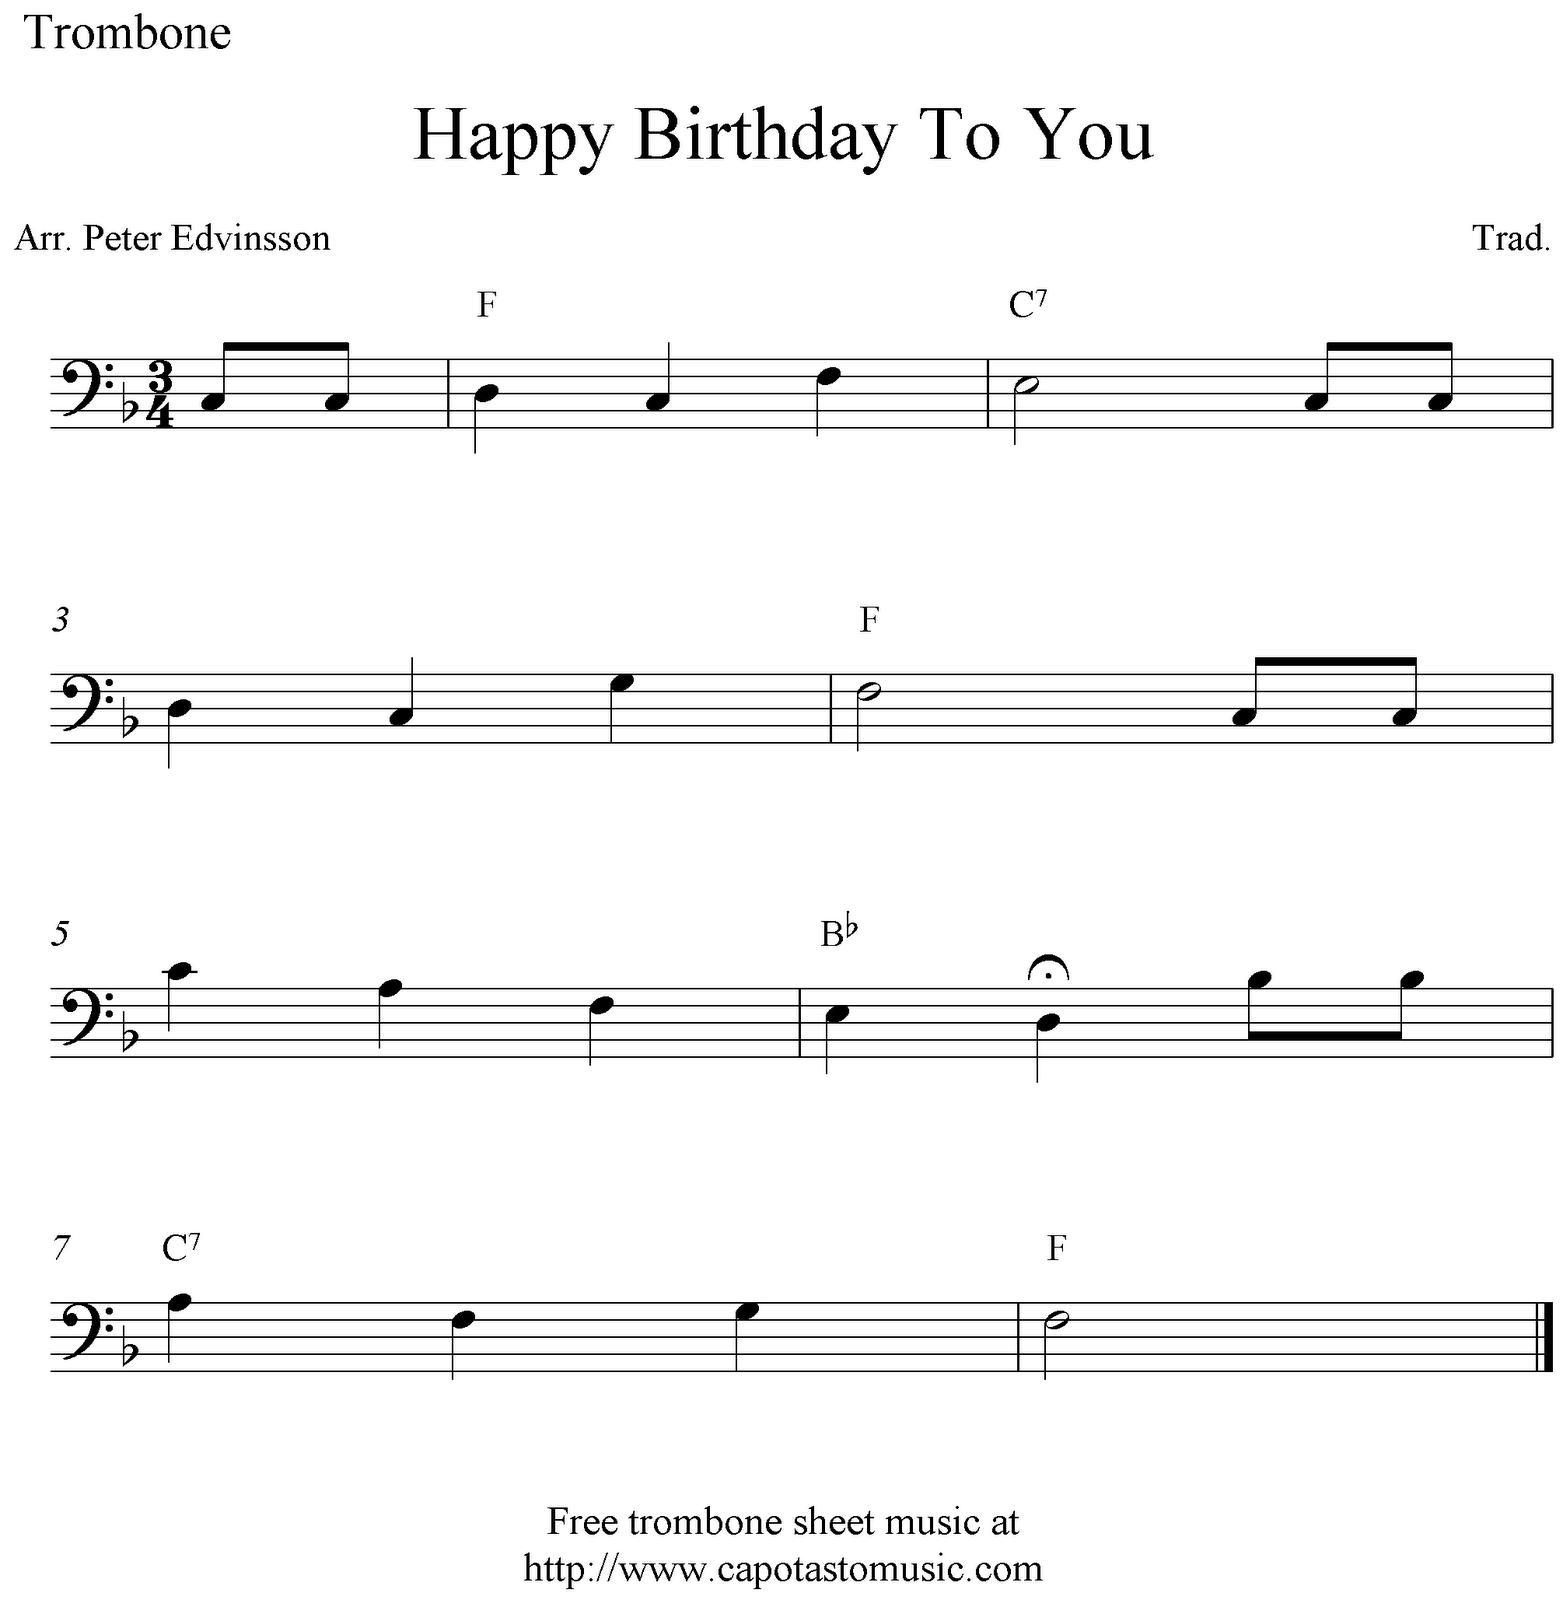 Free Printable Sheet Music Happy Birthday To You, free